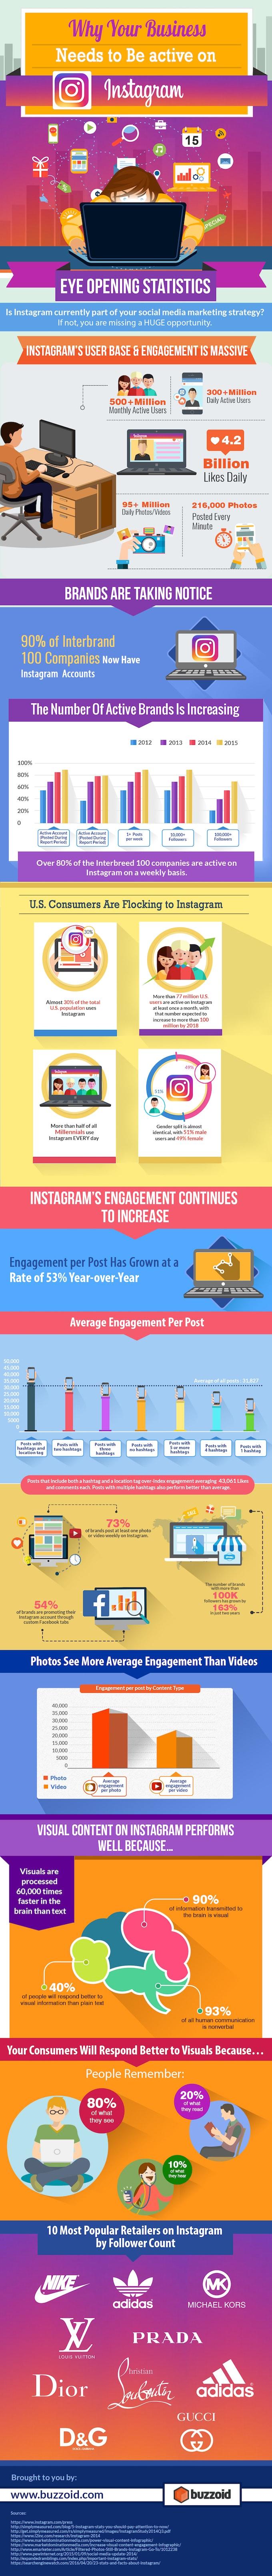 instagram-stats-infographic